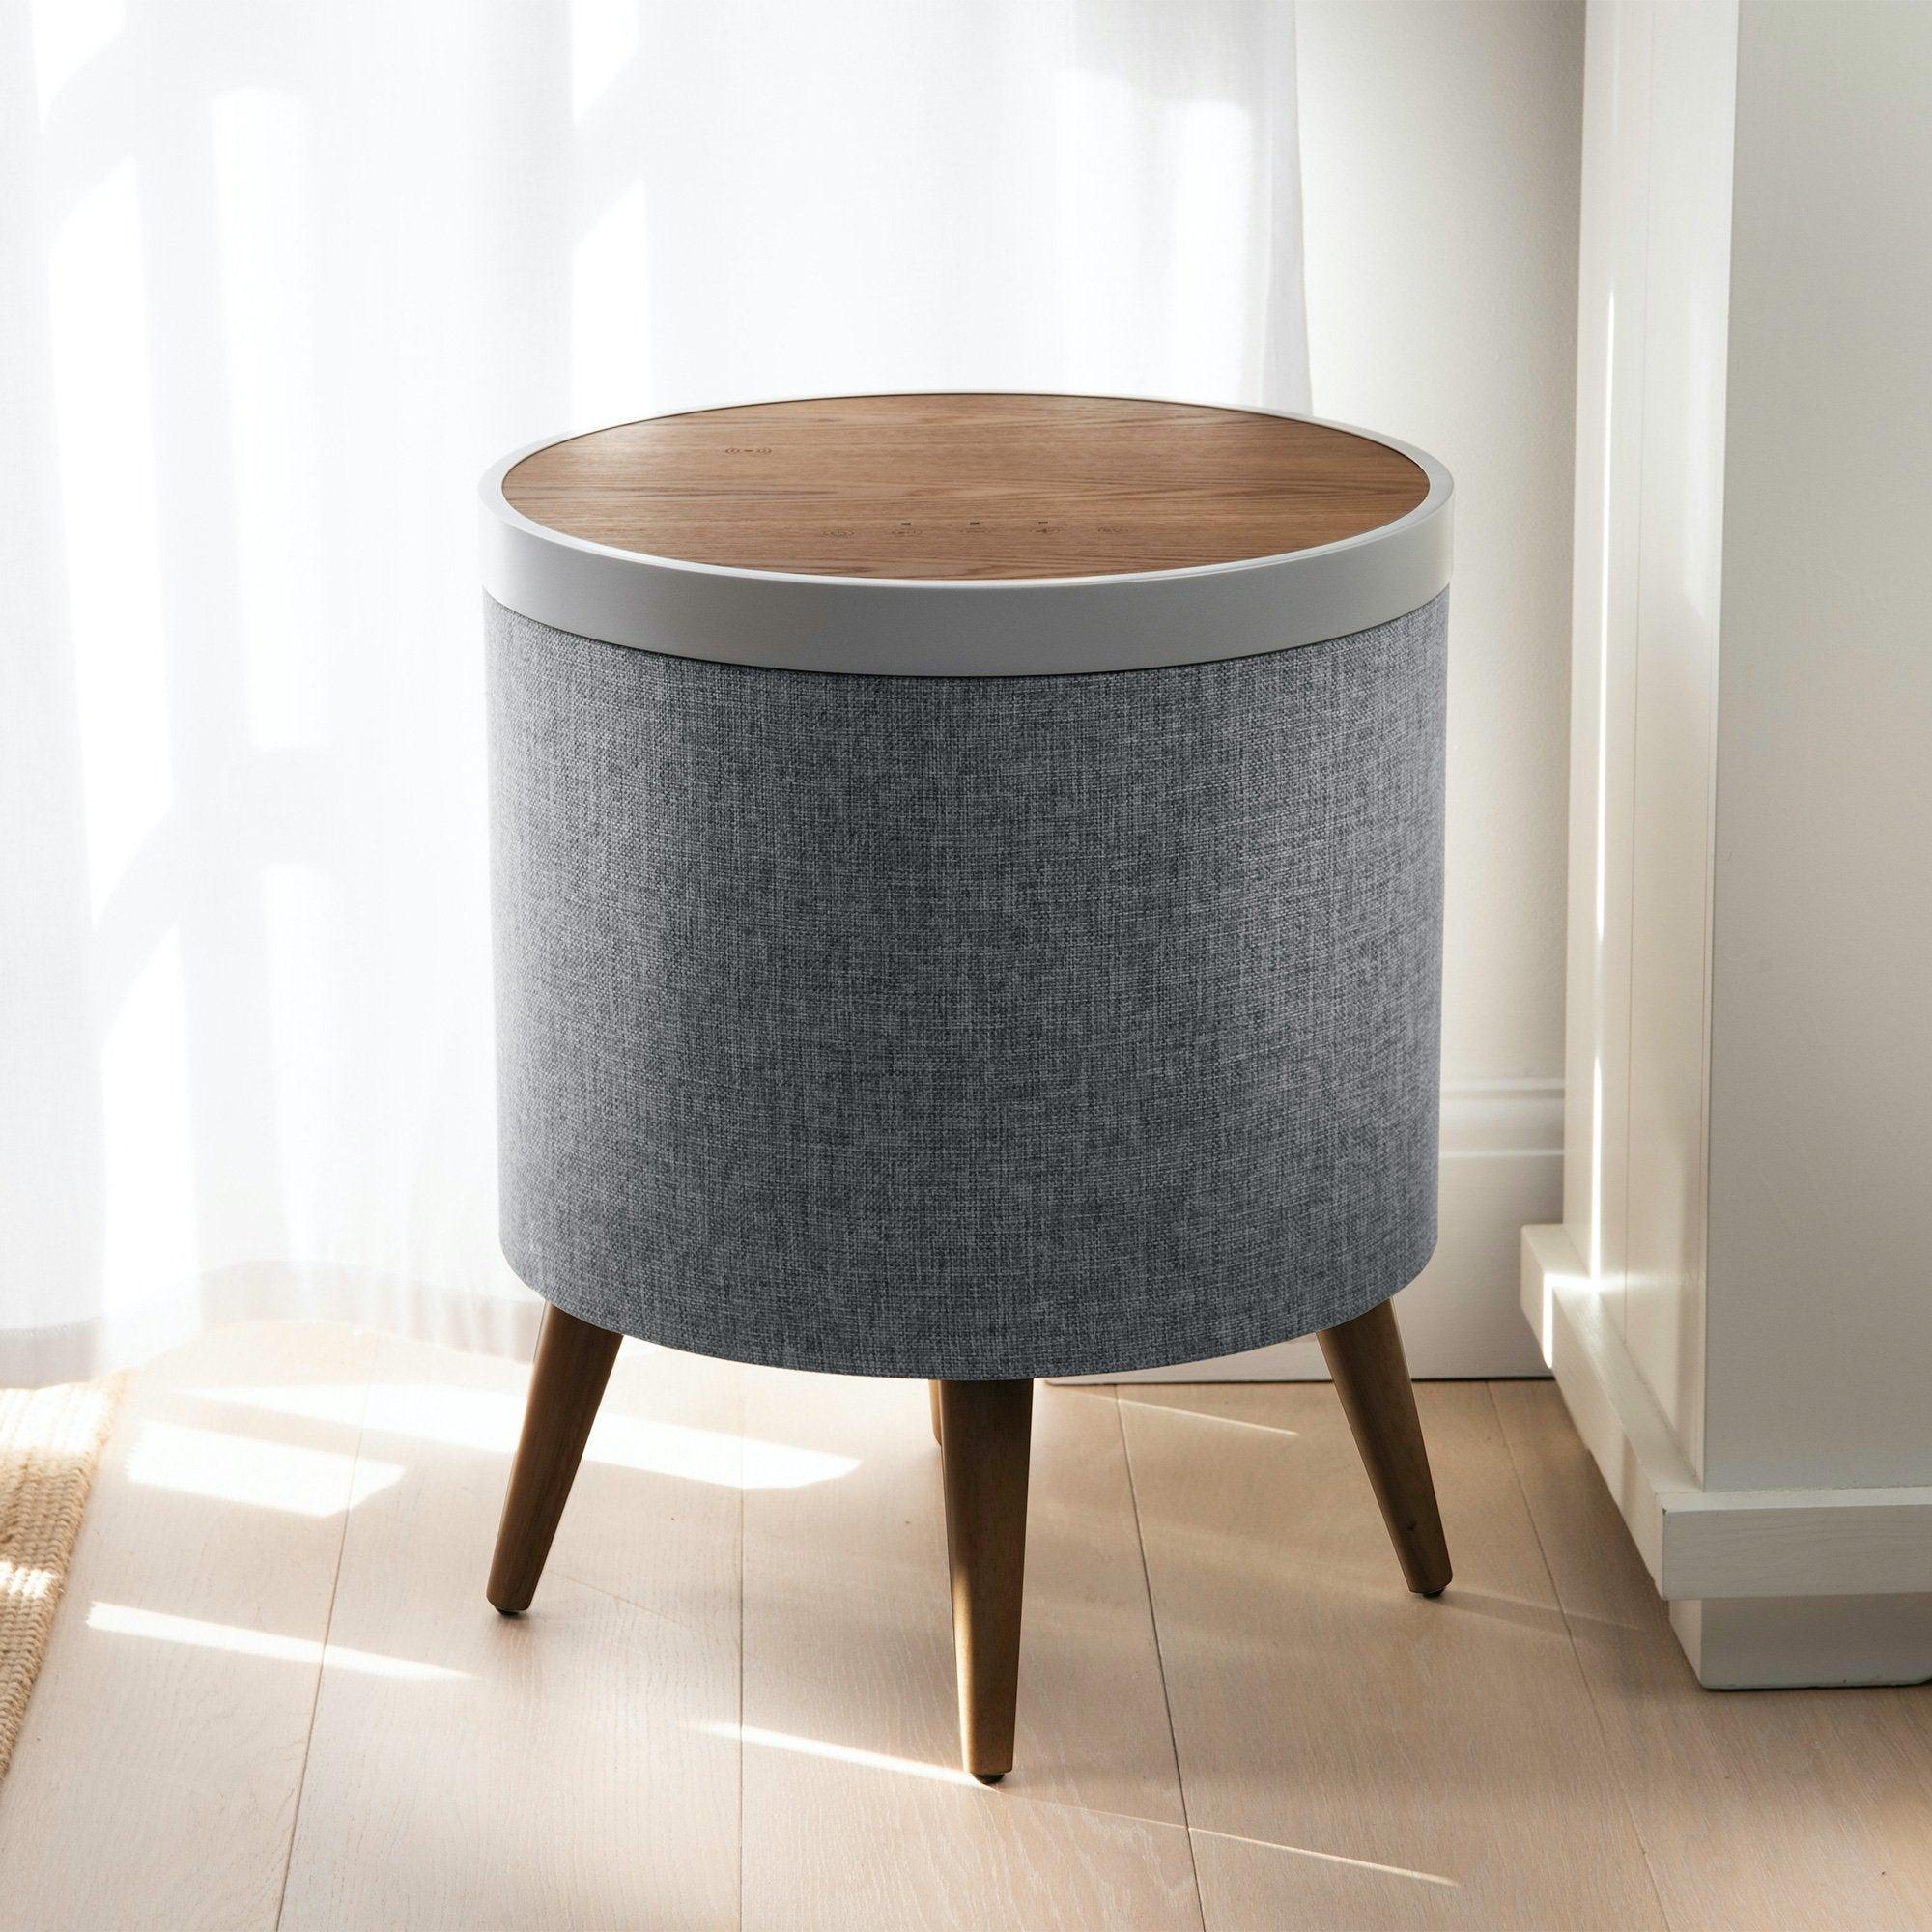 Forward Industries Koble Zain Smart Side Table w/ 360 Bluetooth Speaker and Subwoofer in Oak